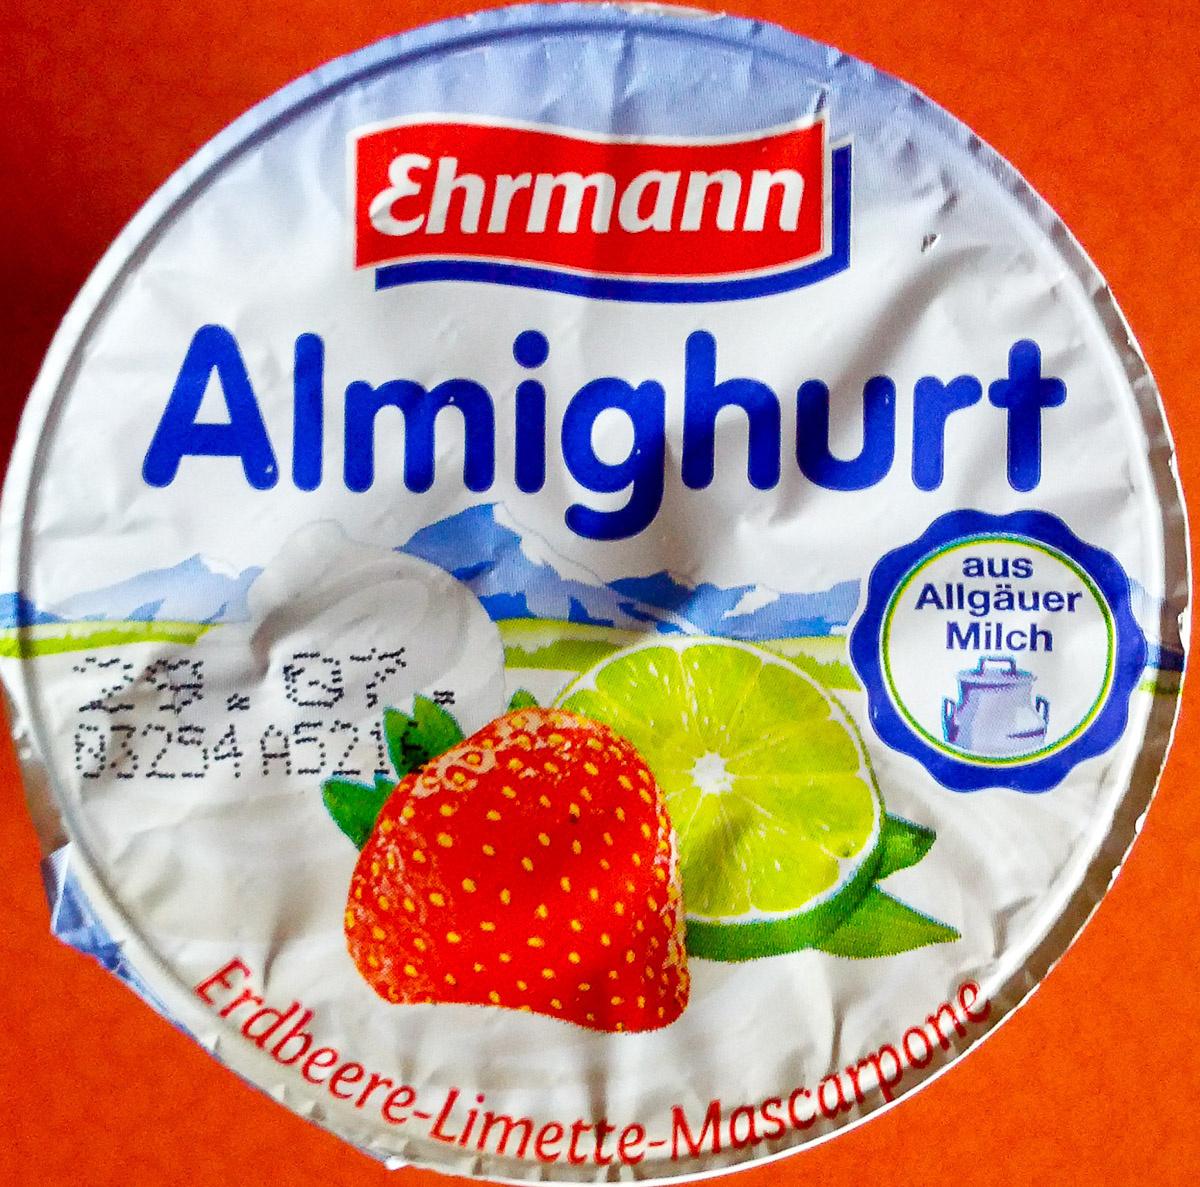 www almighurt